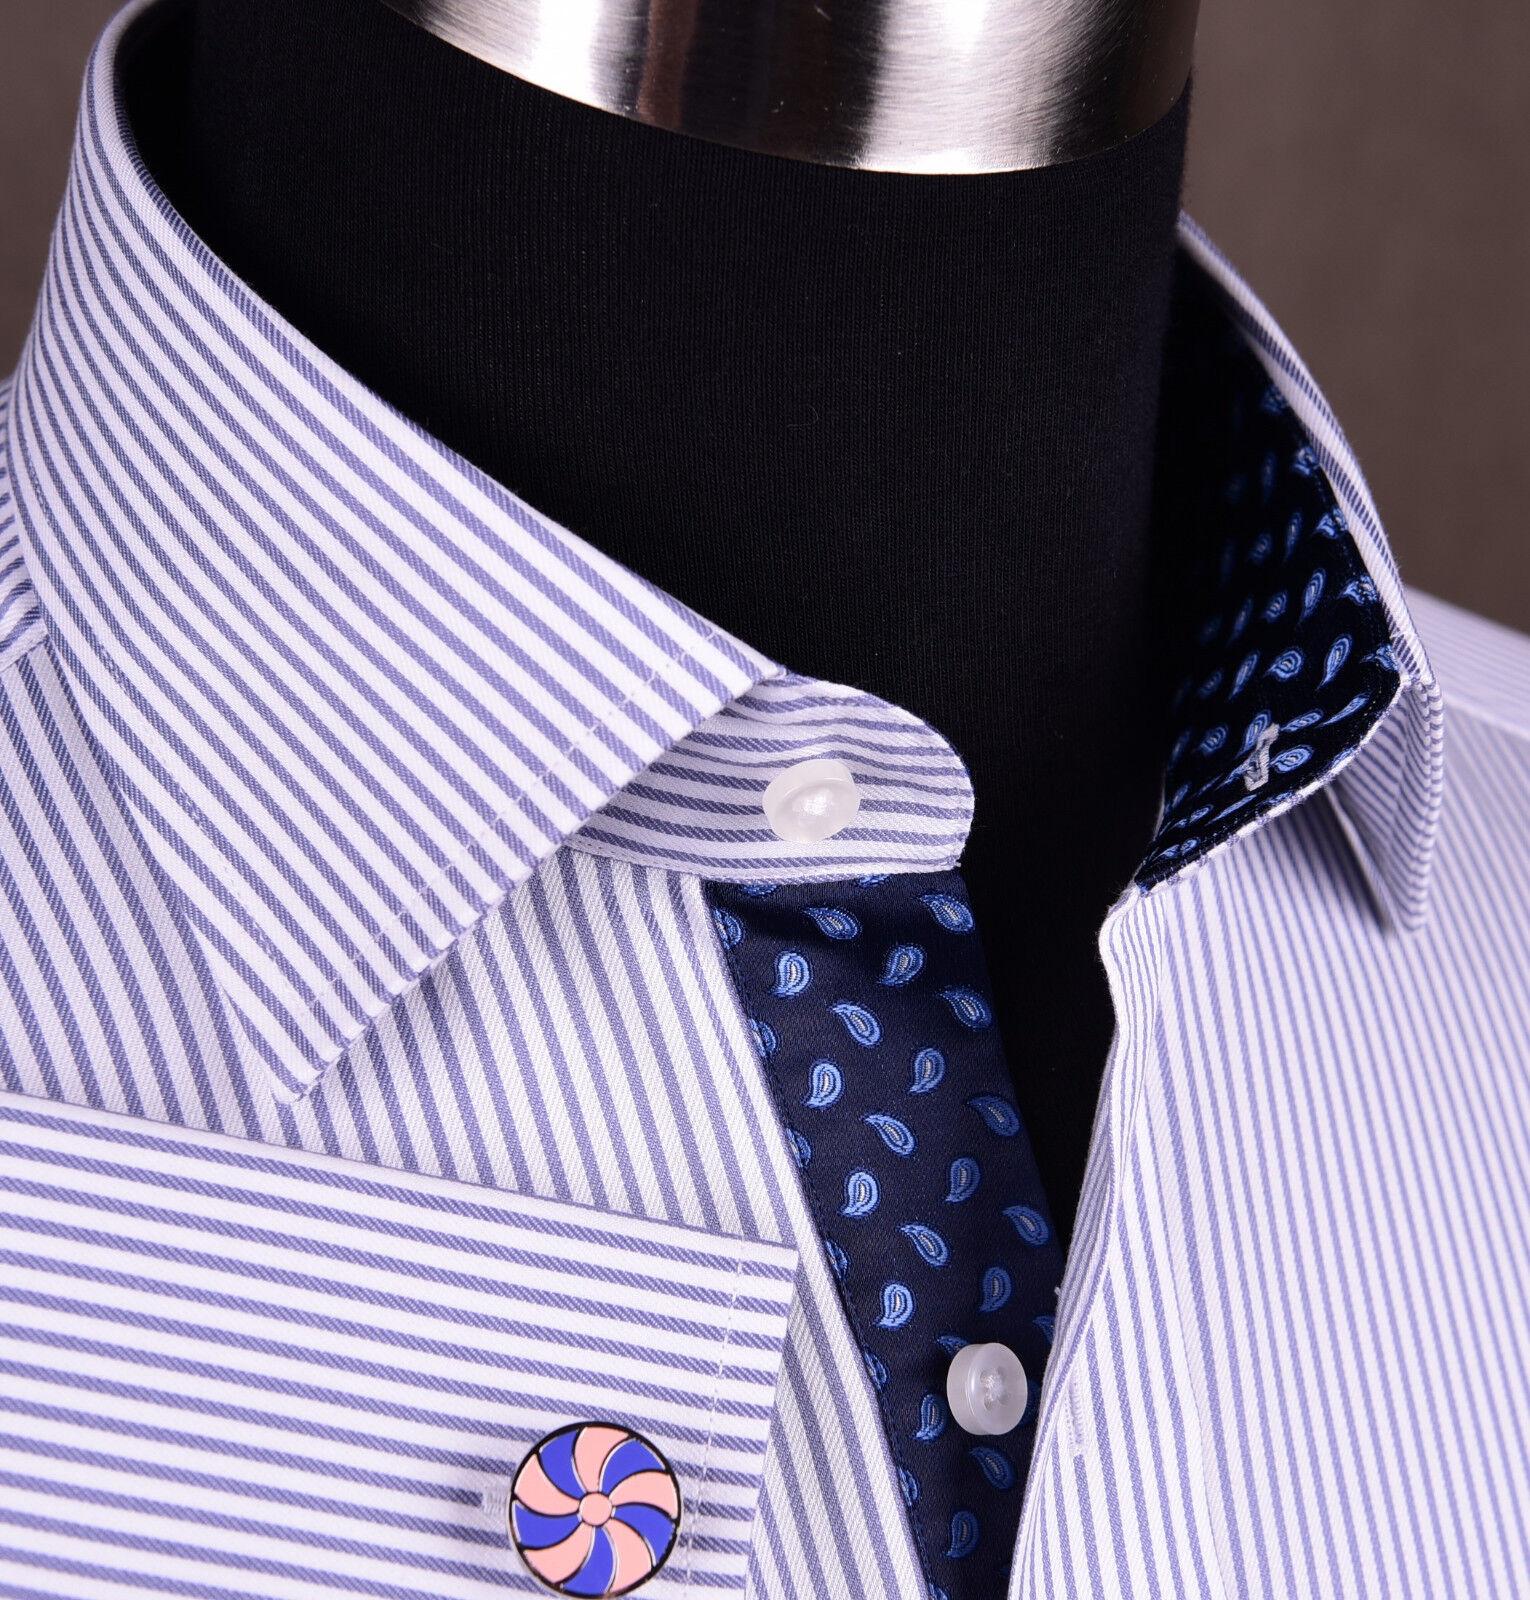 Luxury lila Stripe Formal Geschäft Dress Shirt Blau Floral Violet Herringbone